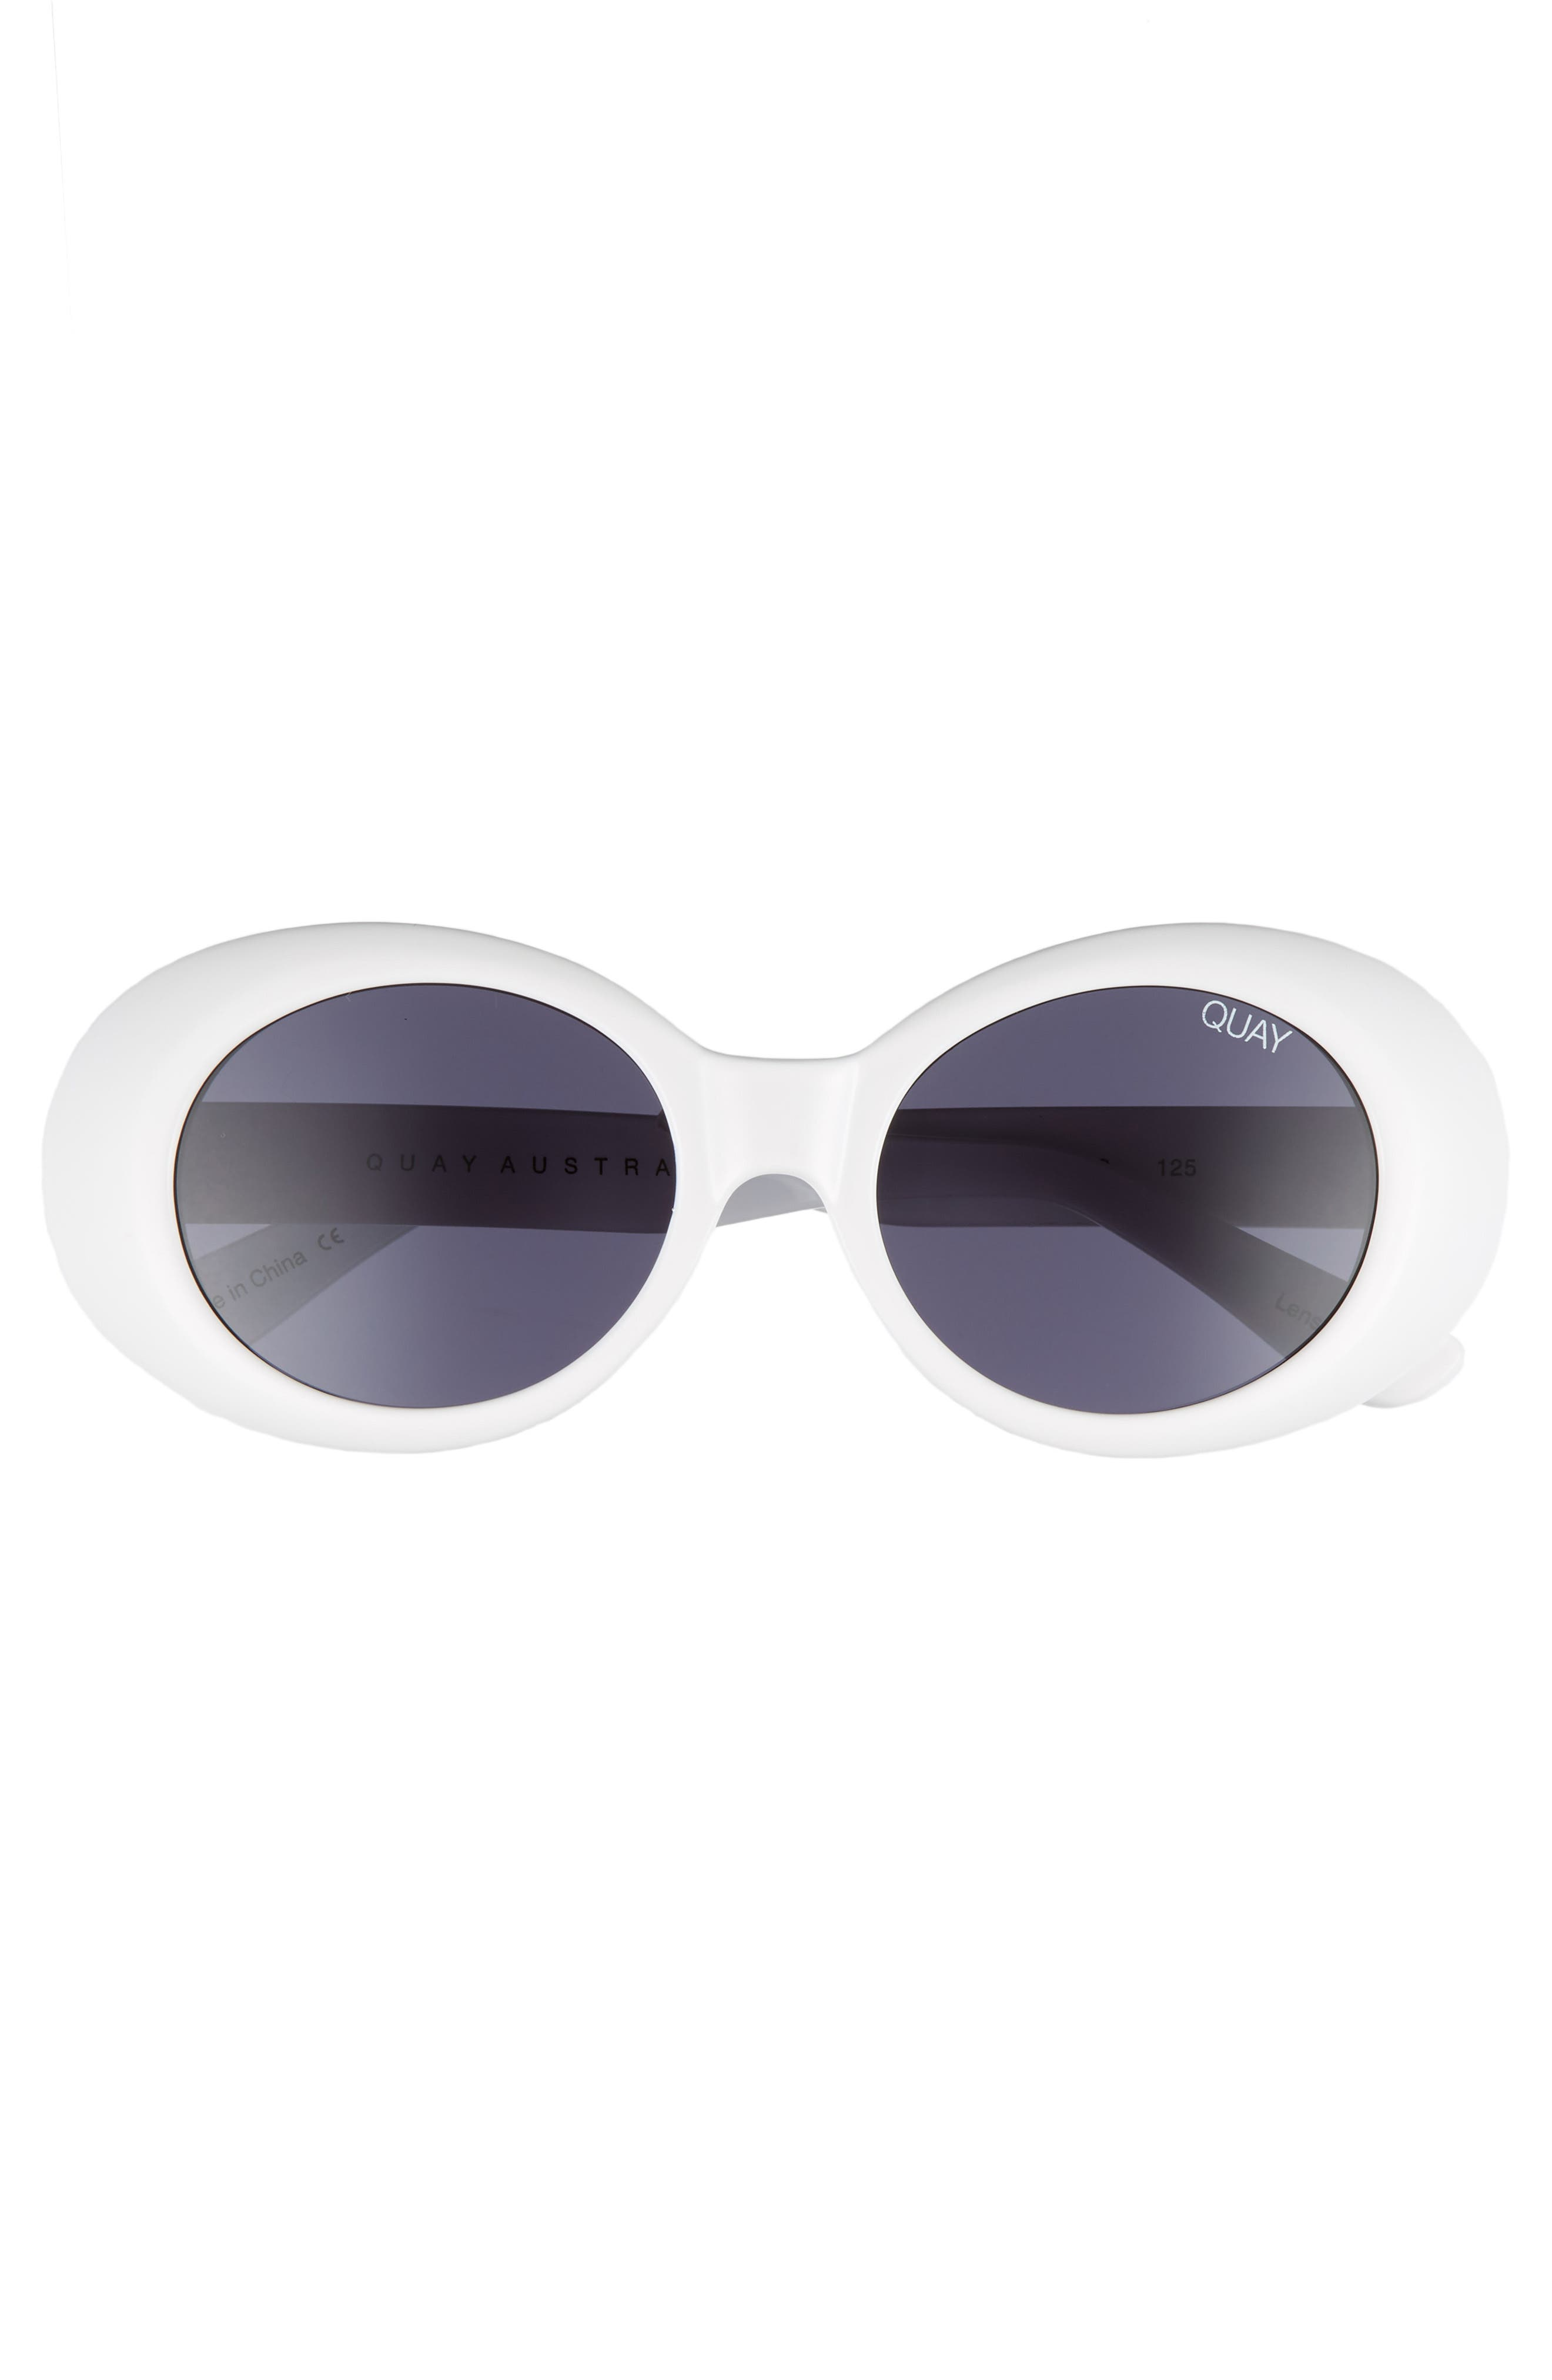 Frivolous 50mm Oval Sunglasses,                             Alternate thumbnail 3, color,                             100